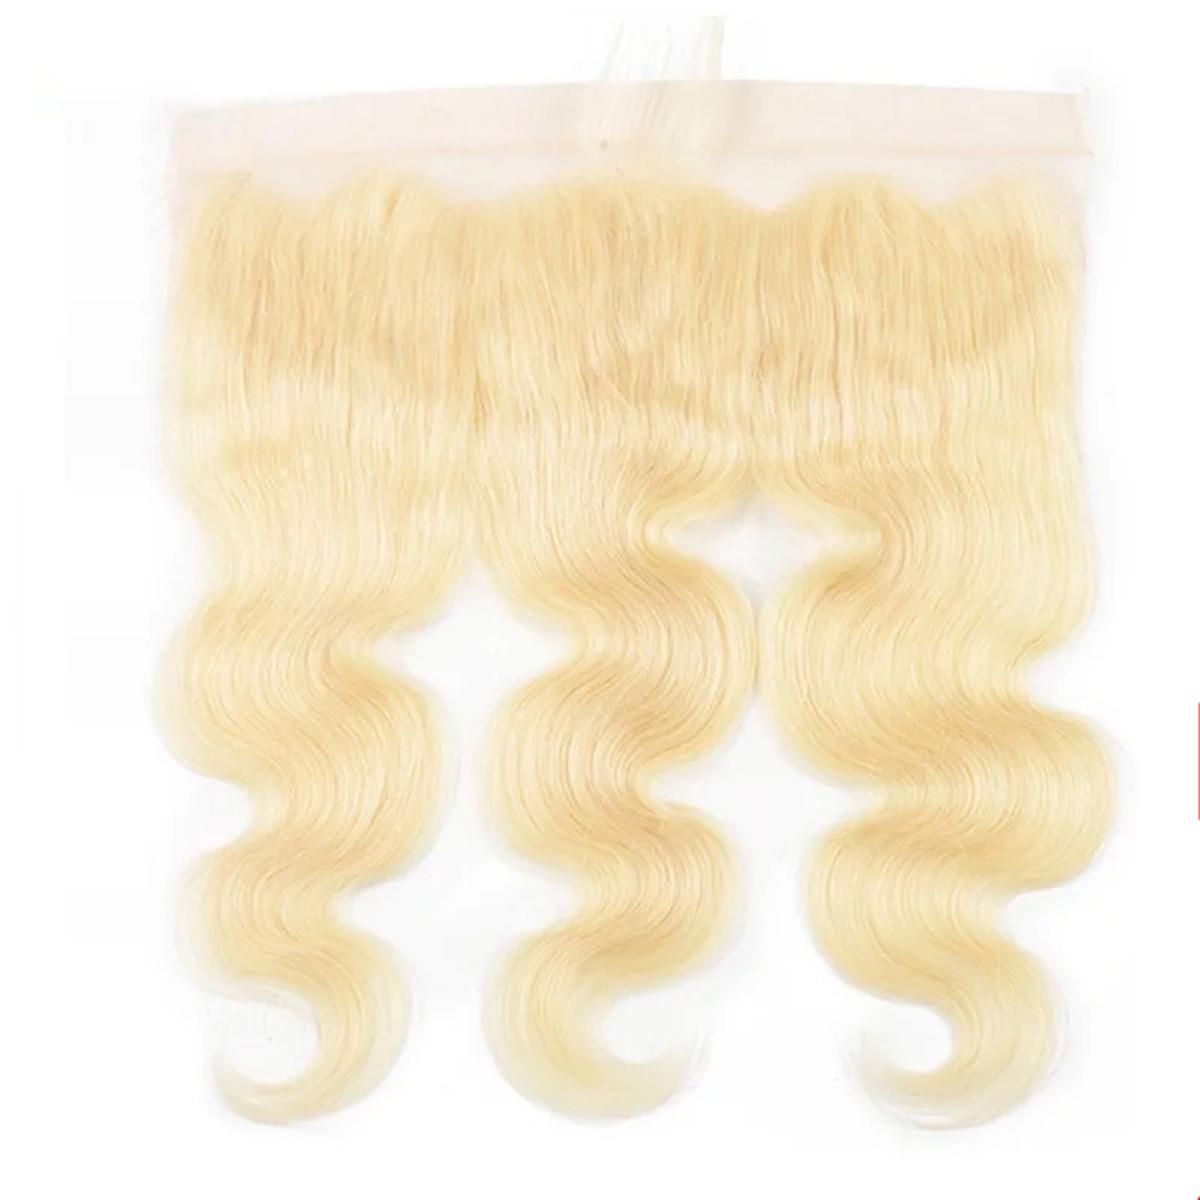 LEDON 13x4 Lace Frontal, Bodywave BW, Color 613, 100% Human Hair Extension